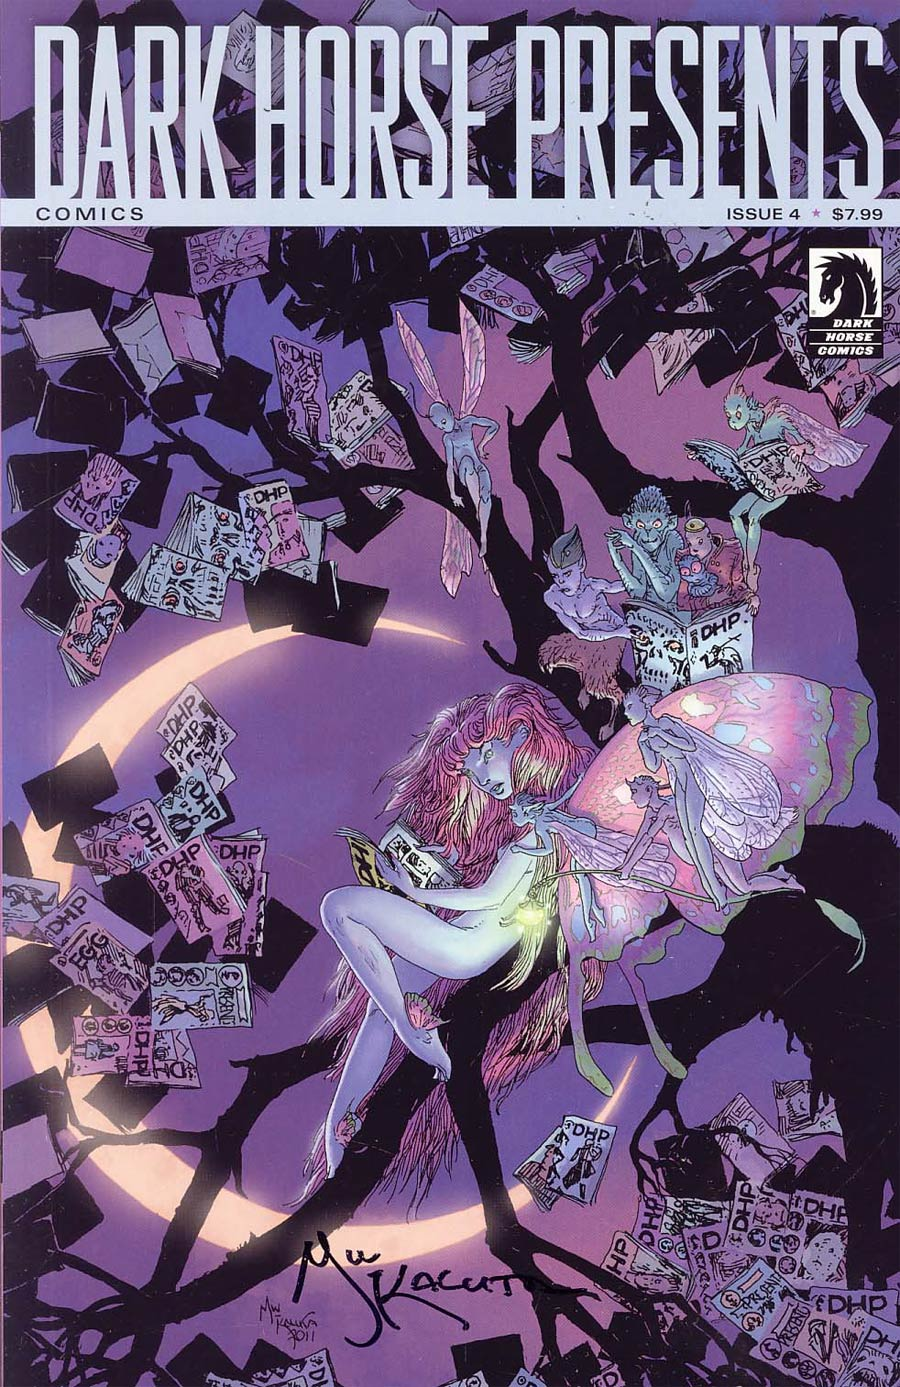 Dark Horse Presents Vol 2 #4 Ultra Variant Kaluta Signed Cover